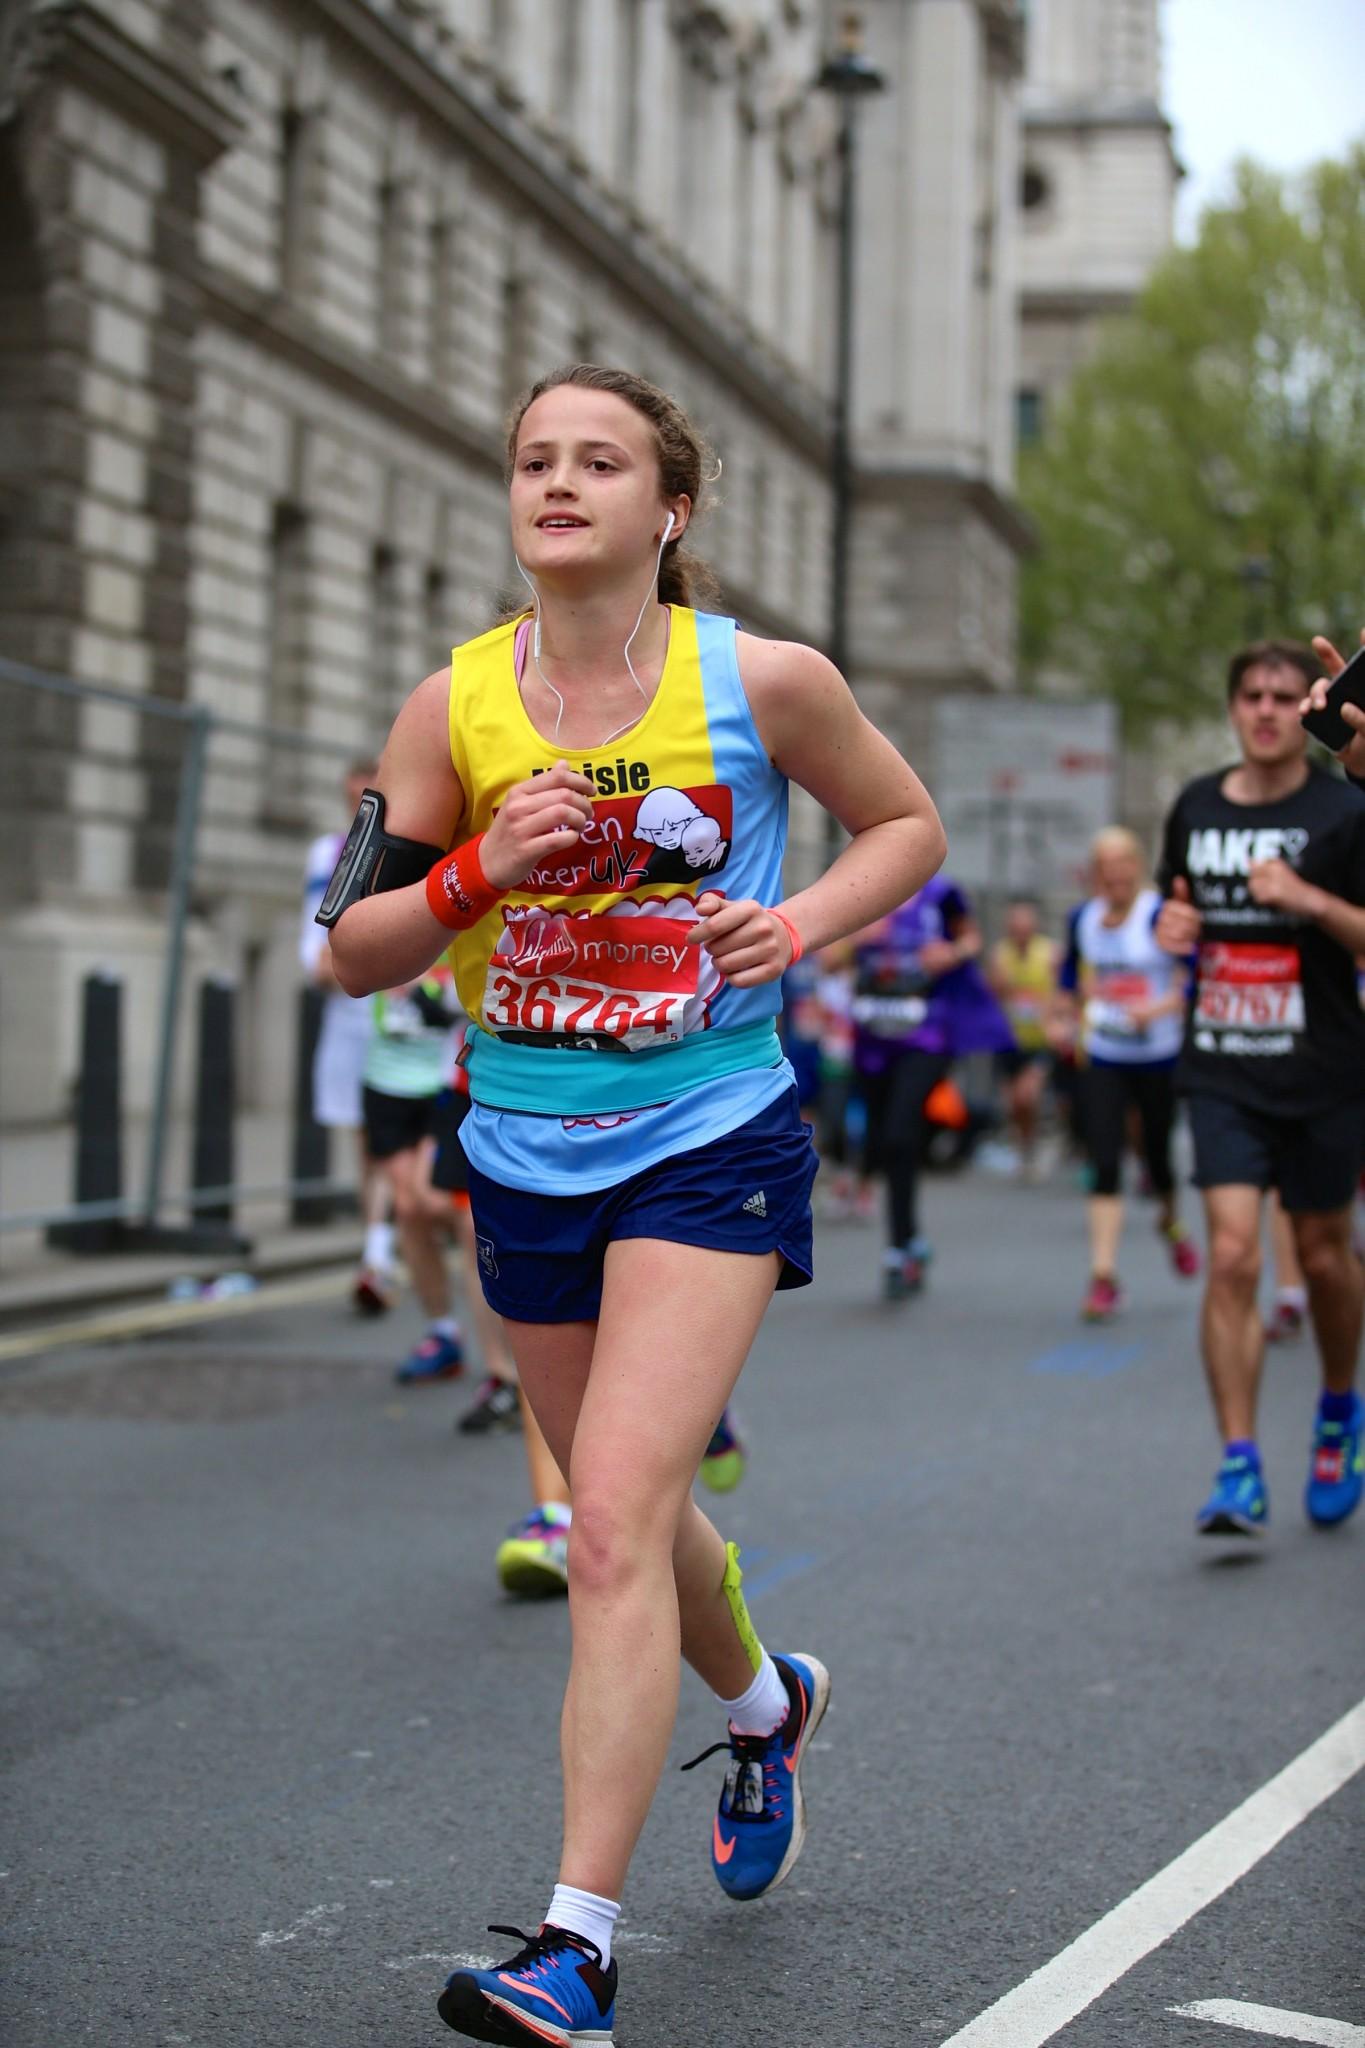 Maisie running the London marathon